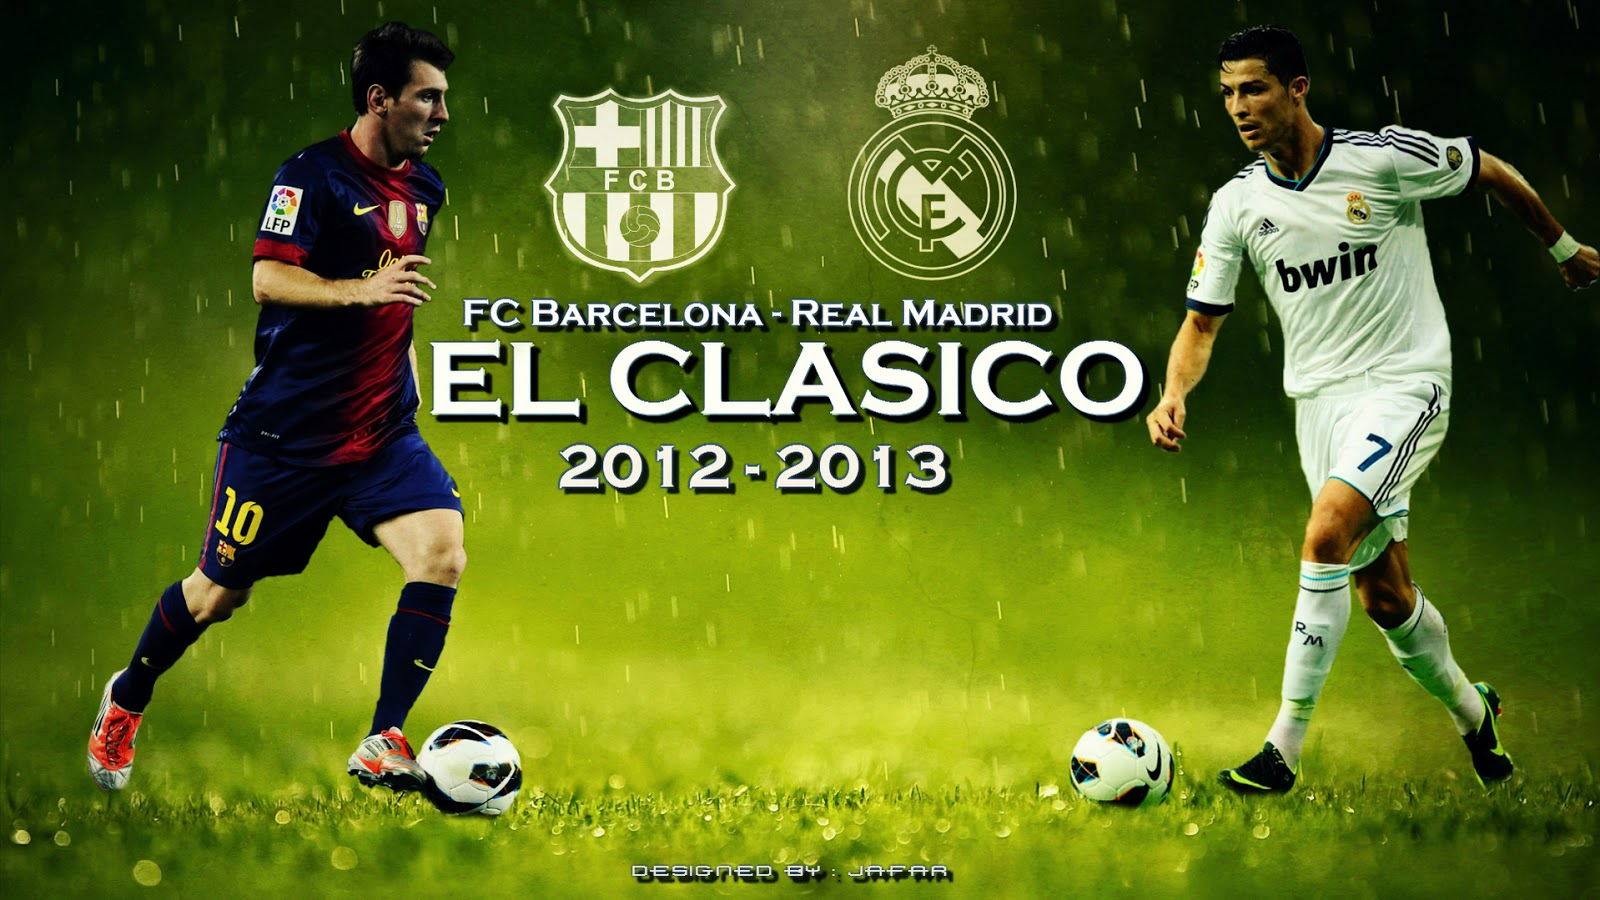 El Clasico Barcelona vs Real Madrid Wallpaper